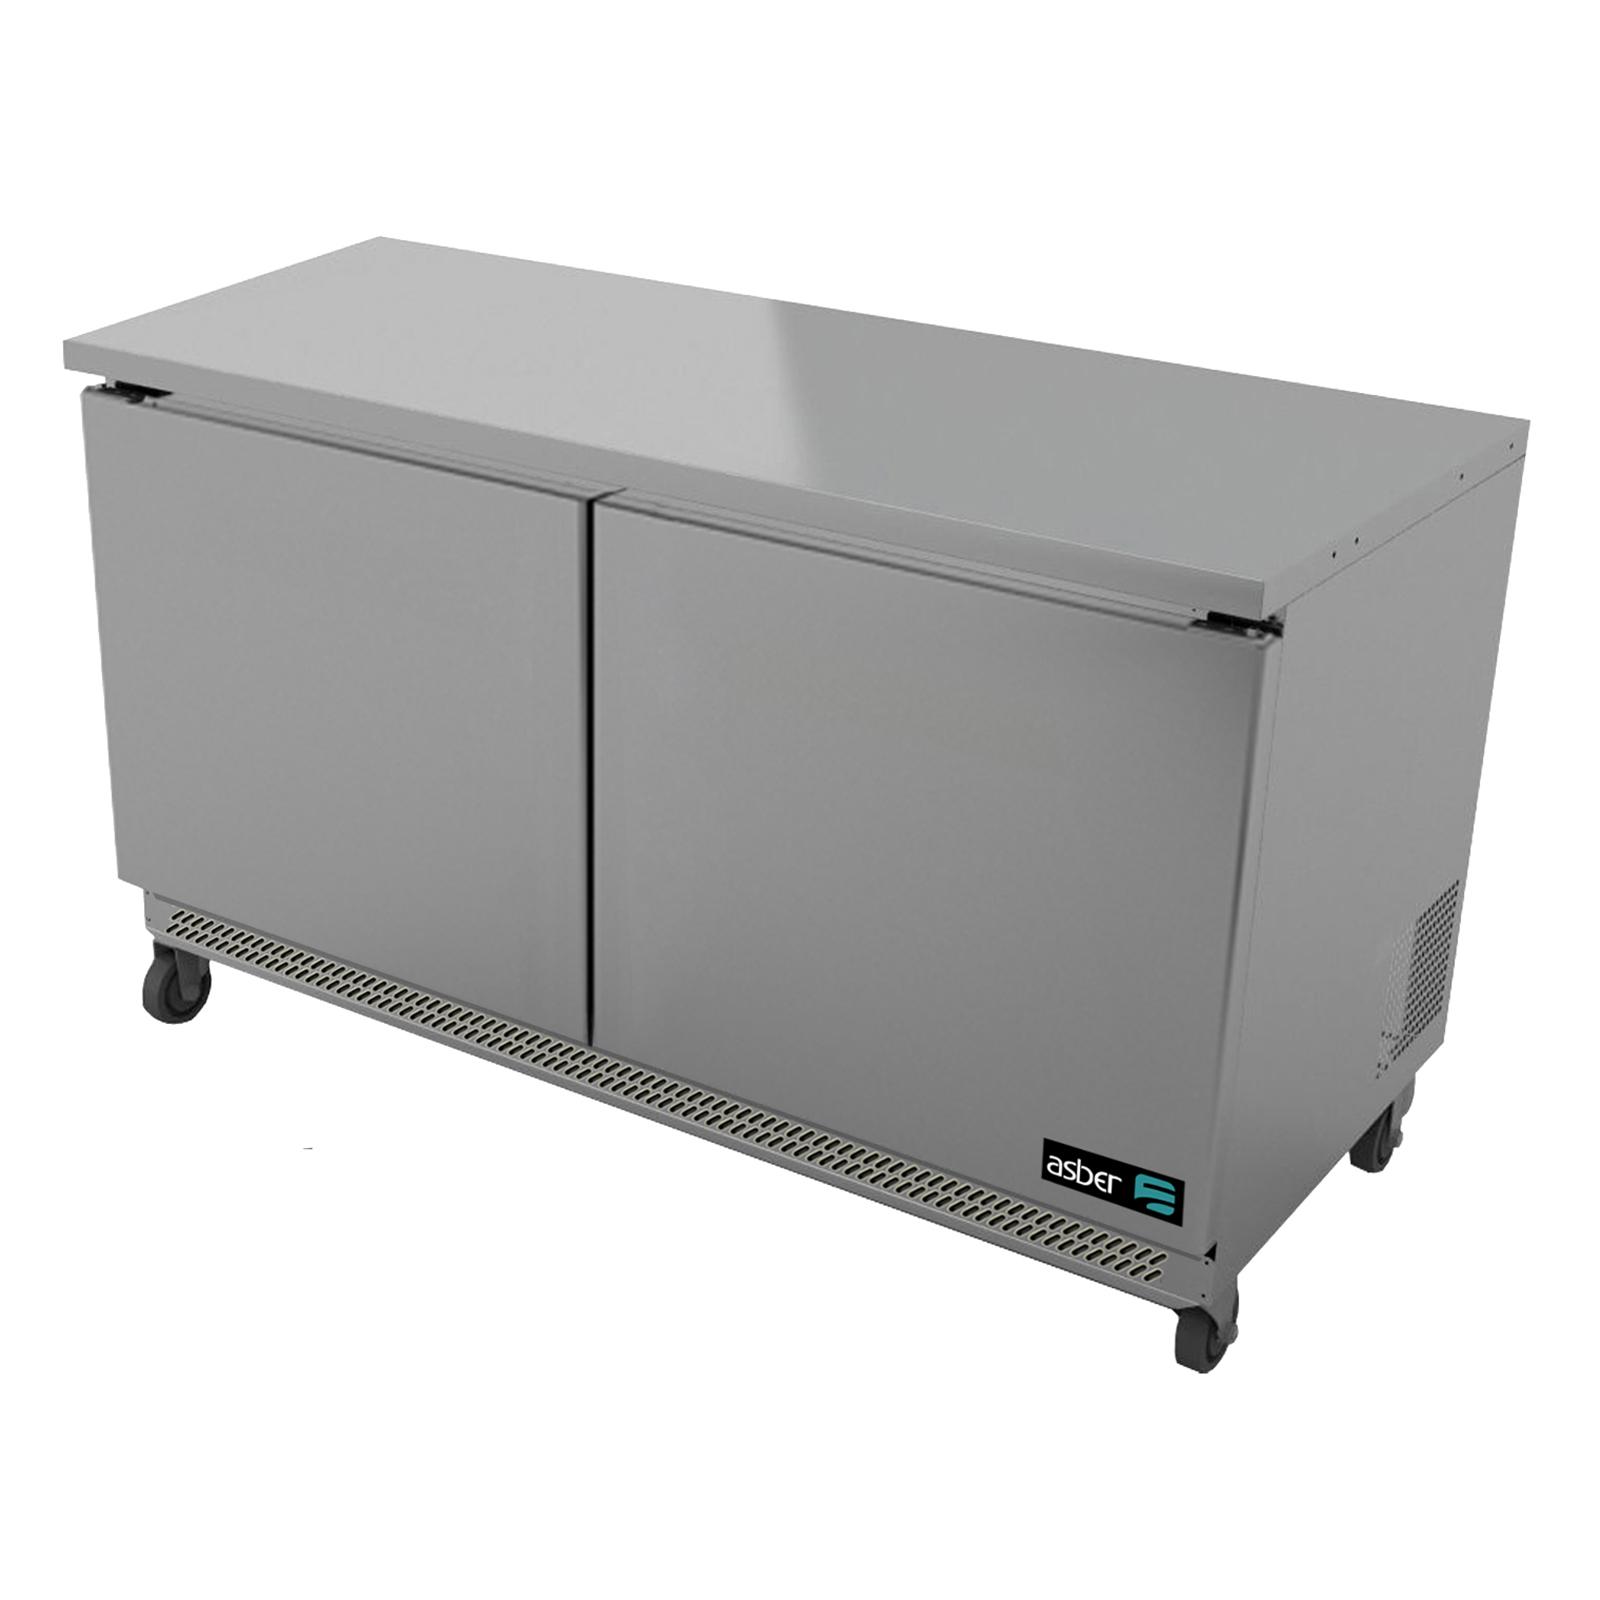 Asber AUTR-48 refrigerator, undercounter, reach-in